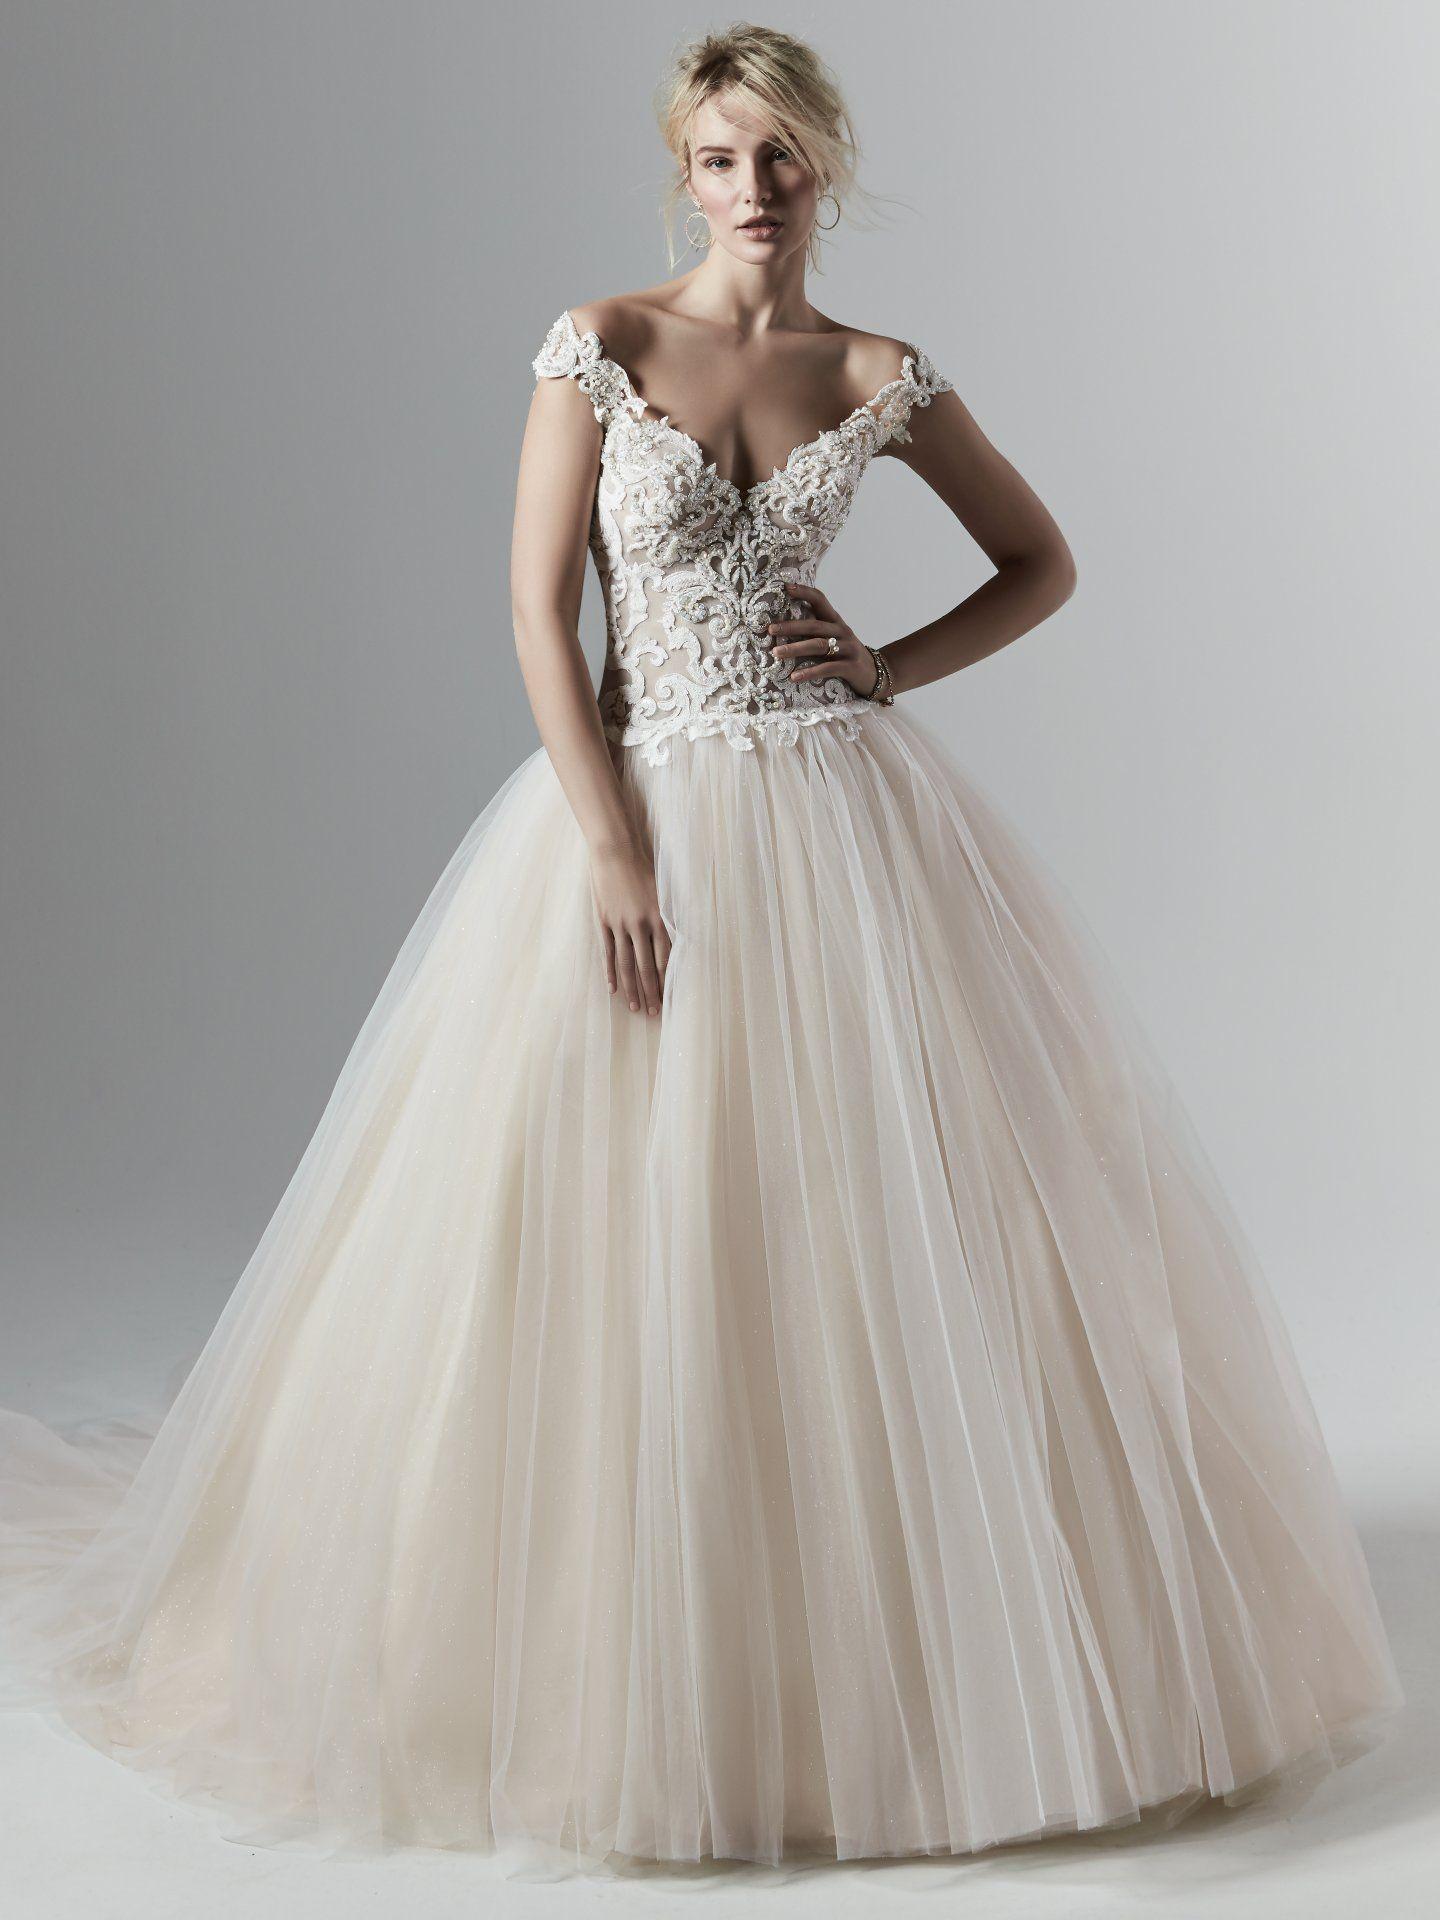 Wedding Dresses Bridal Gowns Wedding Dresses Lace Ballgown Sottero And Midgley Wedding Dresses Lace Princess Wedding Dresses [ 1920 x 1440 Pixel ]